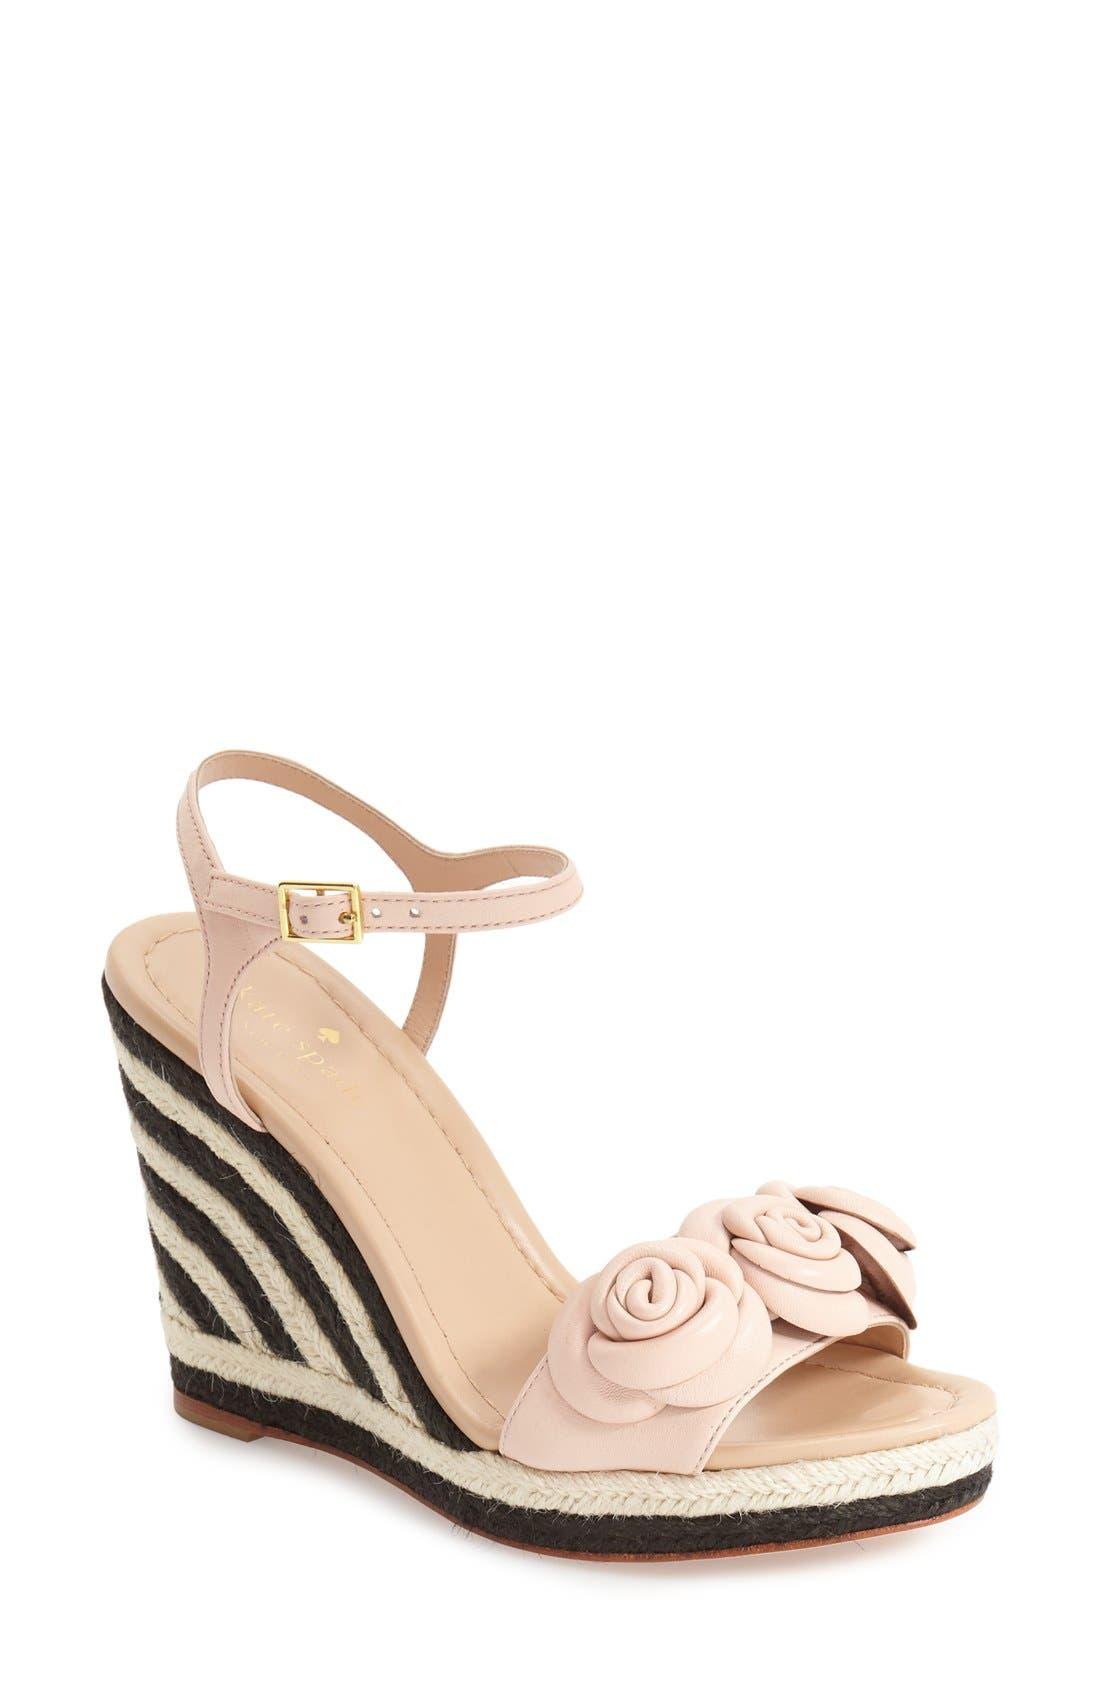 Alternate Image 1 Selected - kate spade new york 'jill' espadrille wedge sandal (Women)